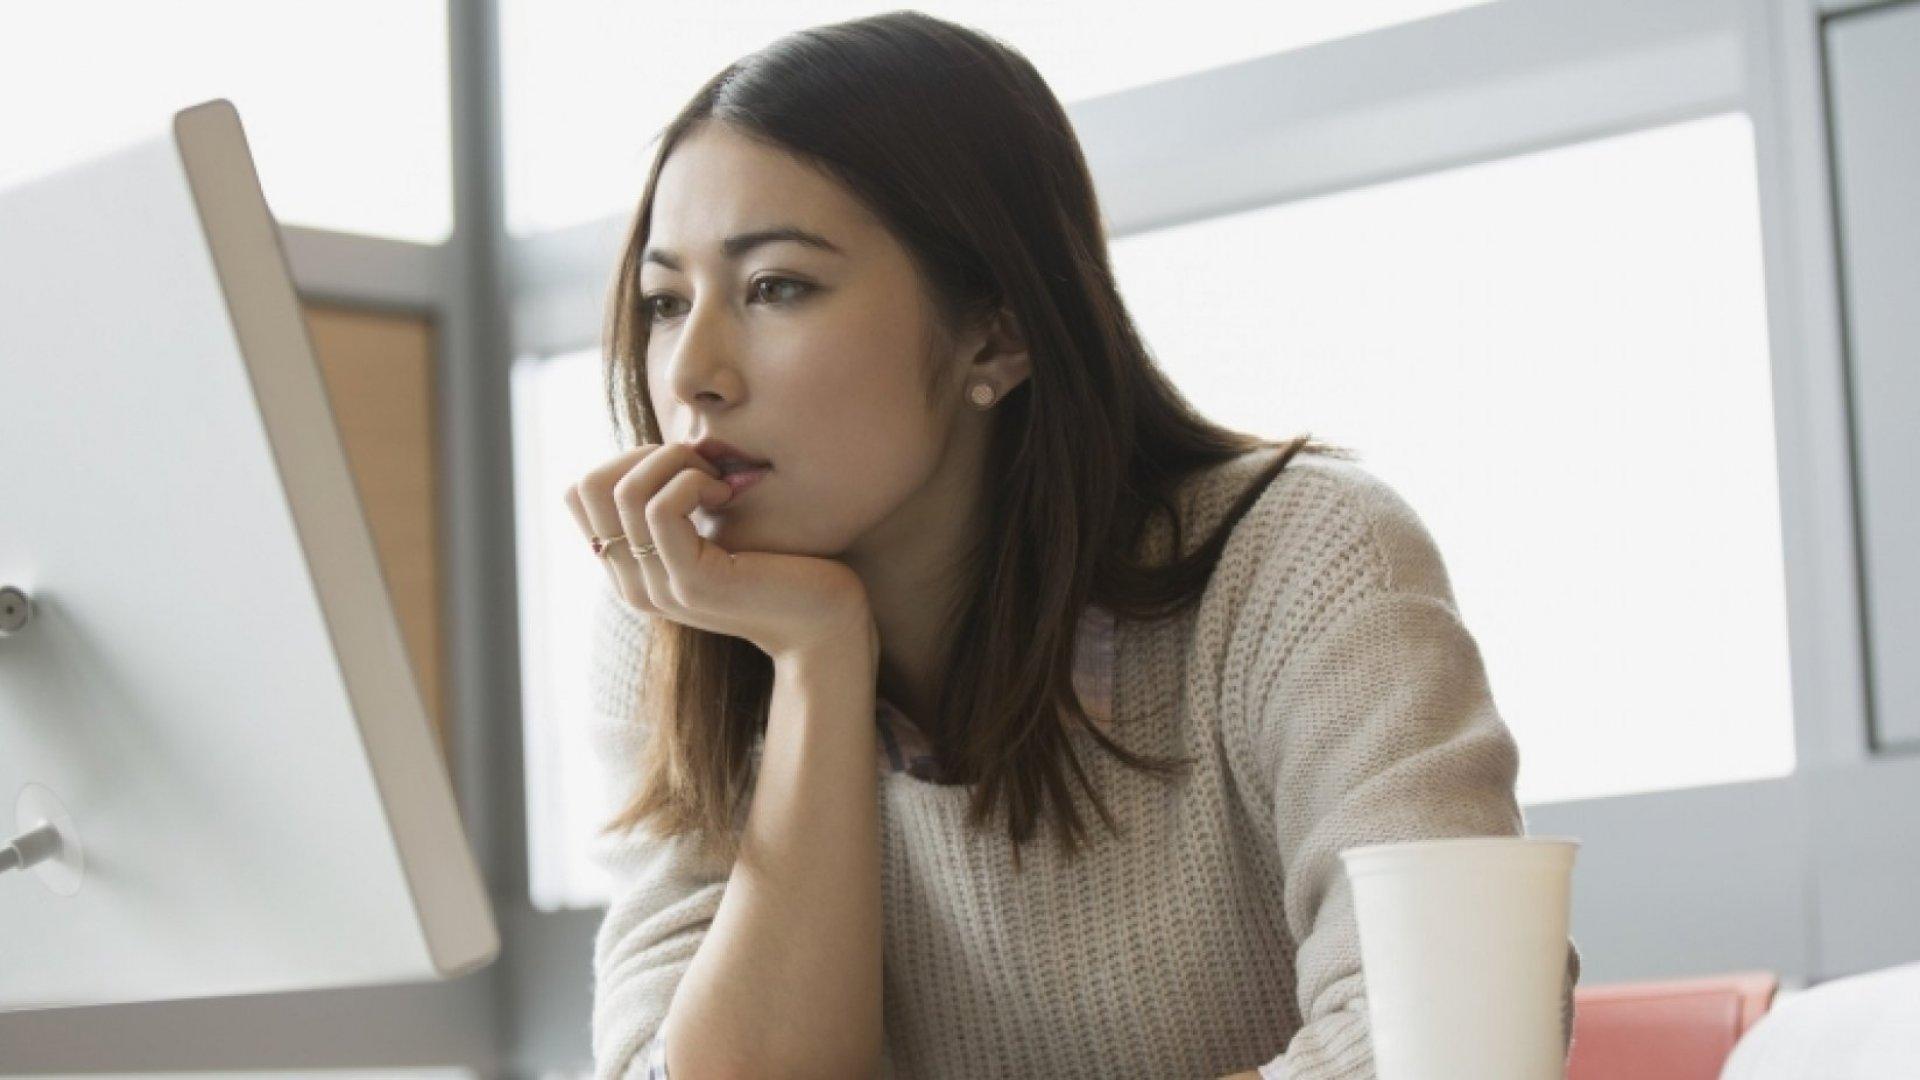 Millennials, Women, and Cybersecurity: New Survey Reveals an Alarming Trend